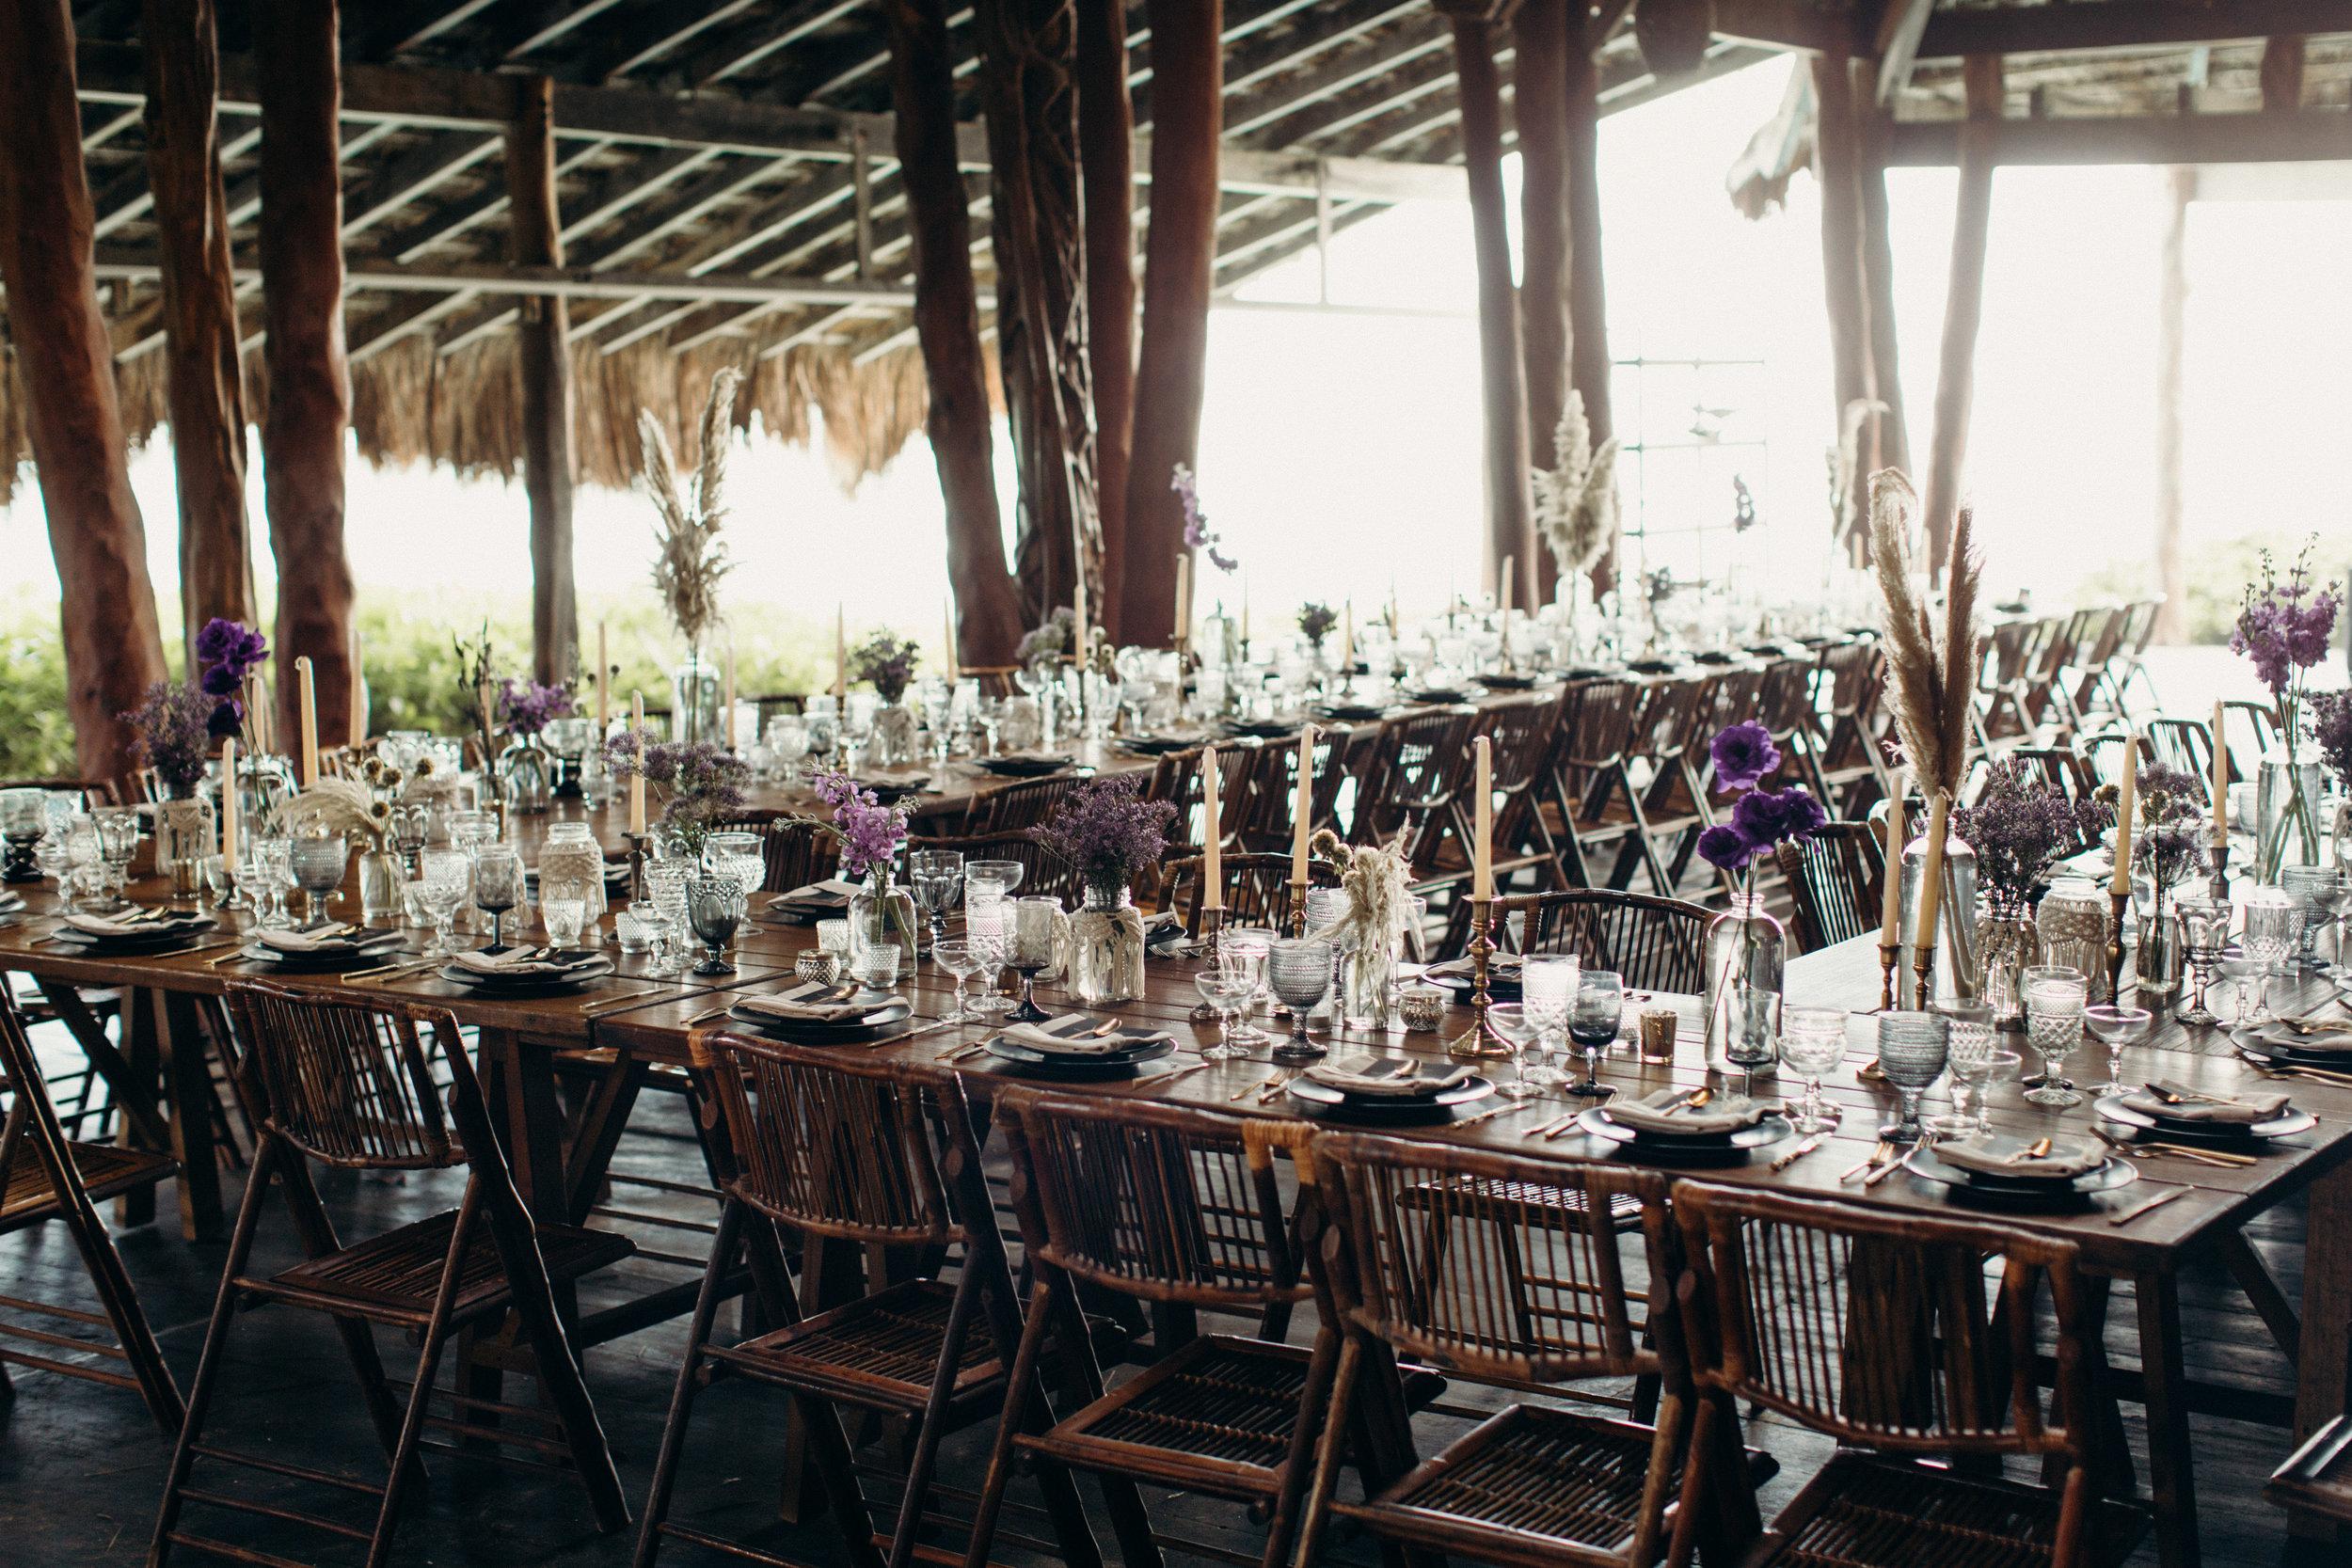 Malin-Akerman-Wedding-Tulum-Andrea-Freeman-Events-5.JPG